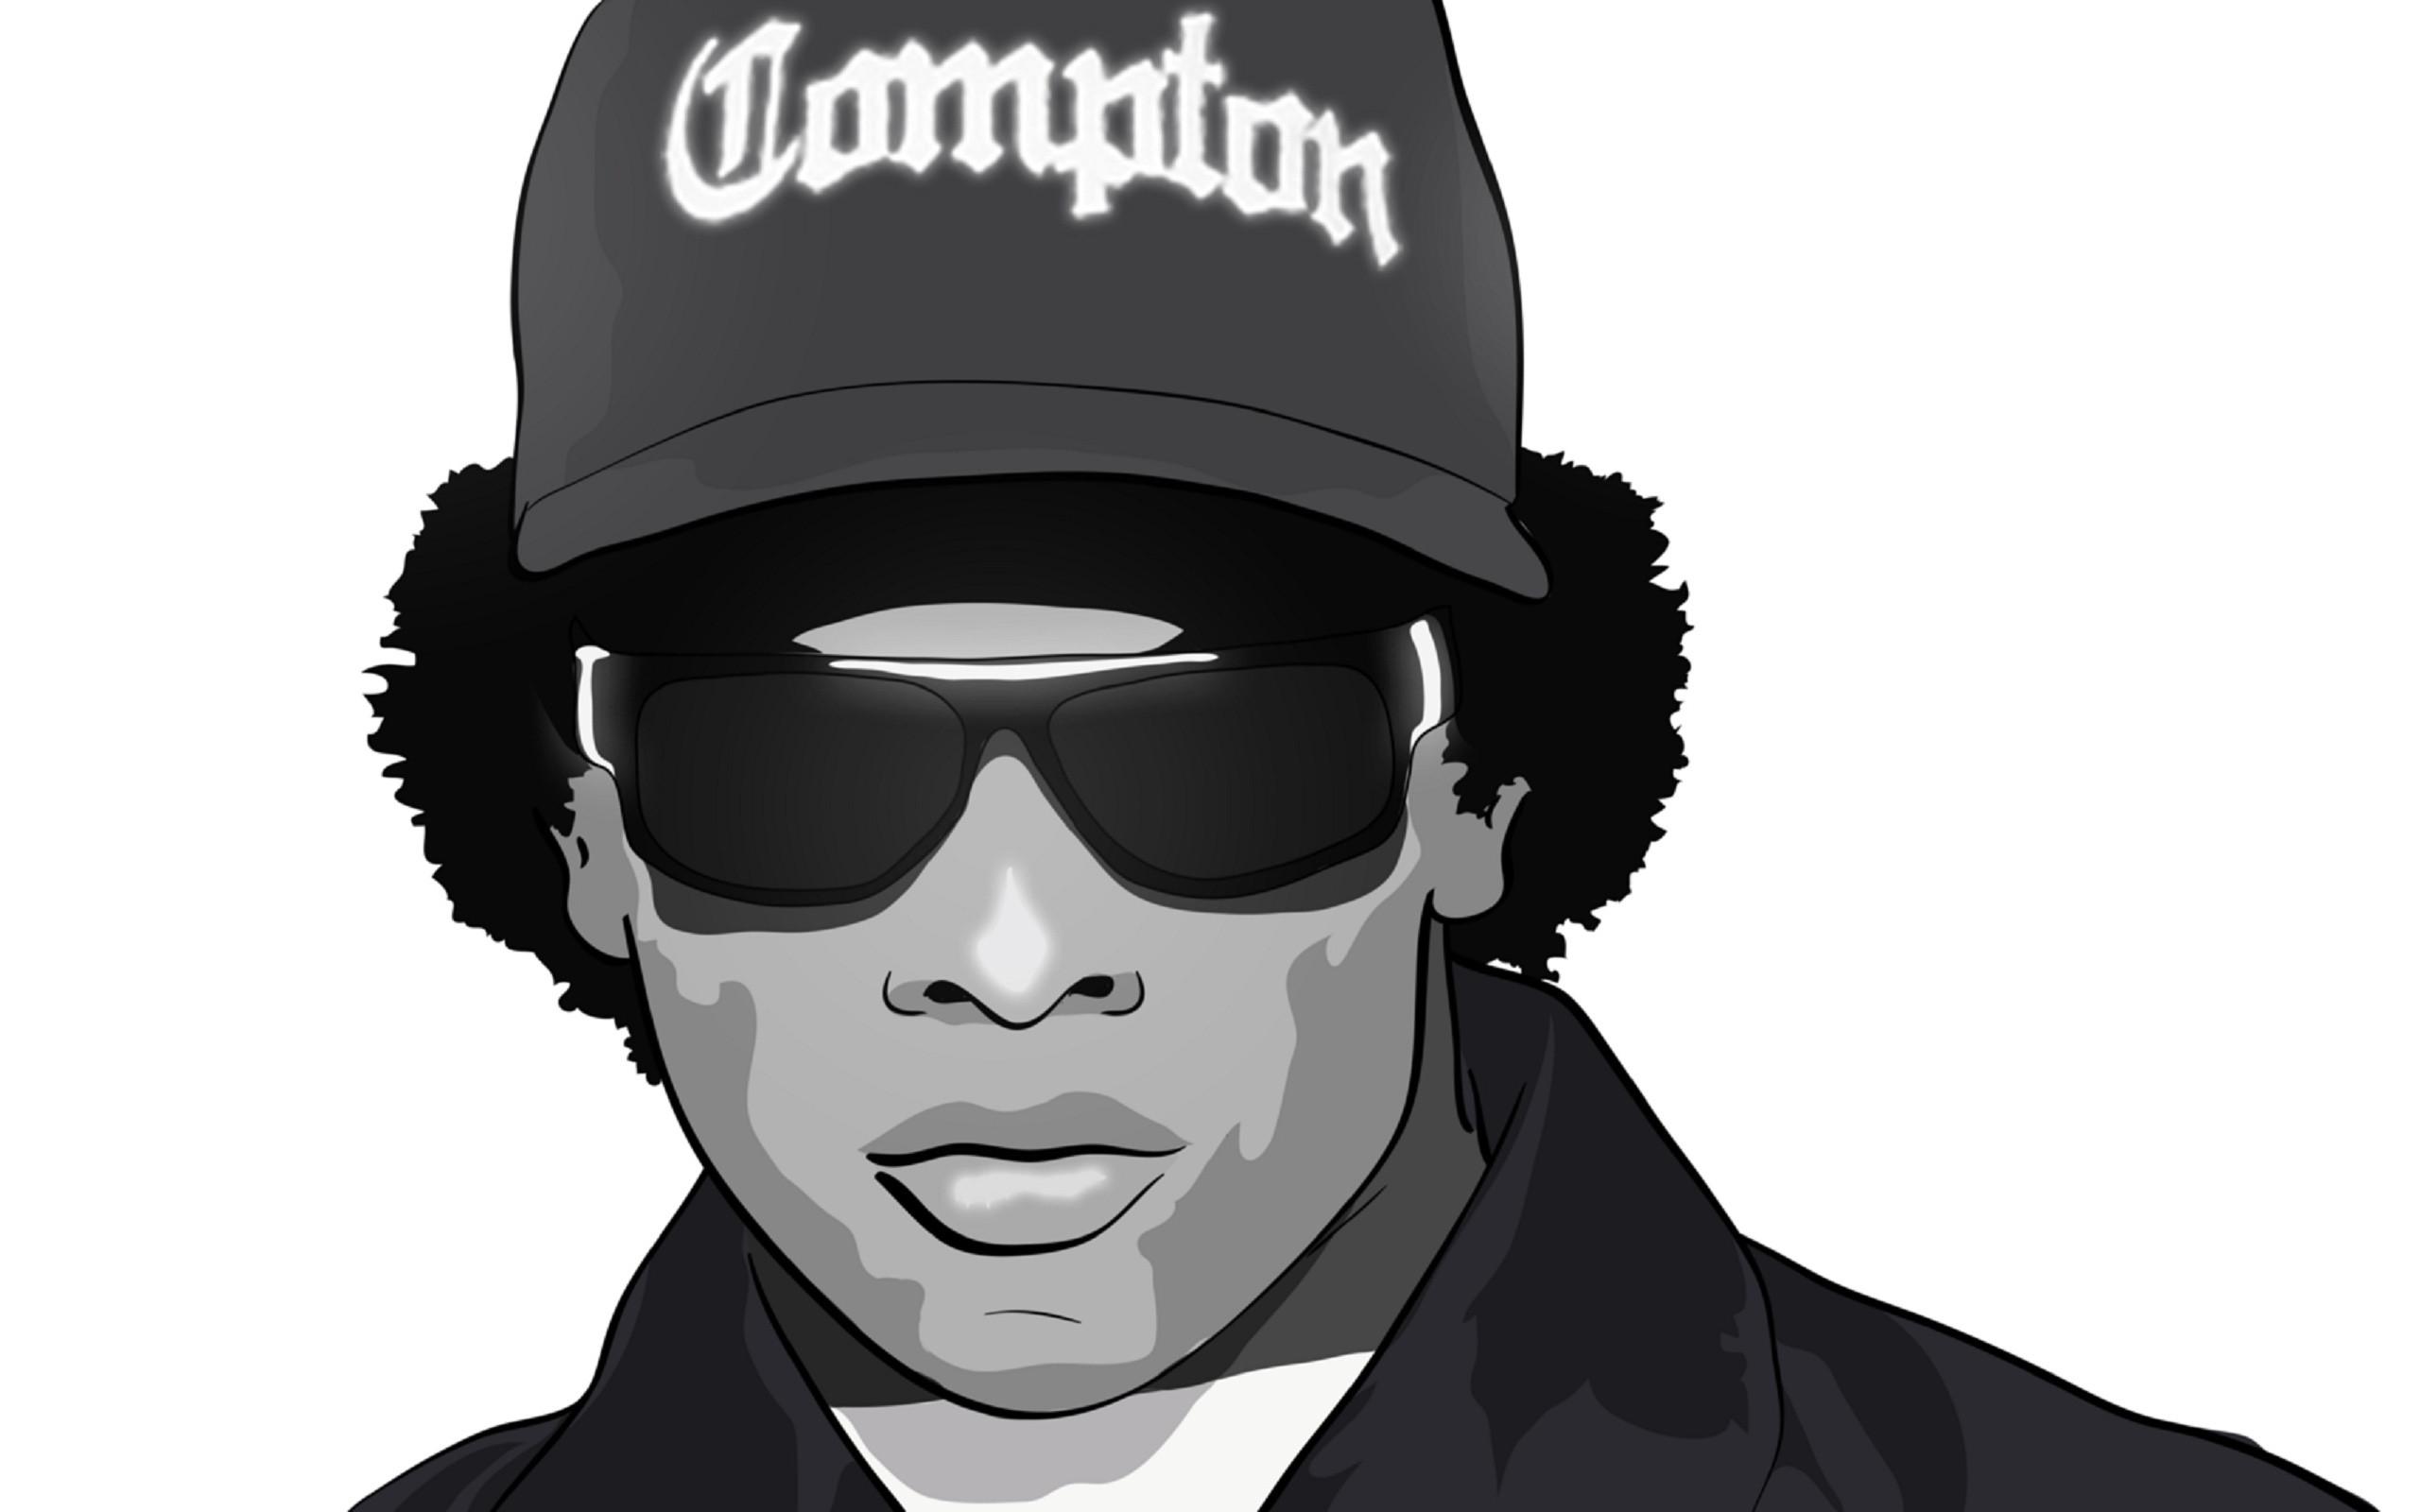 Res: 2560x1600, Eazy Enwa, Hip Hop, Rapper, Nwa, Rap, Singer, Eazy Enwa